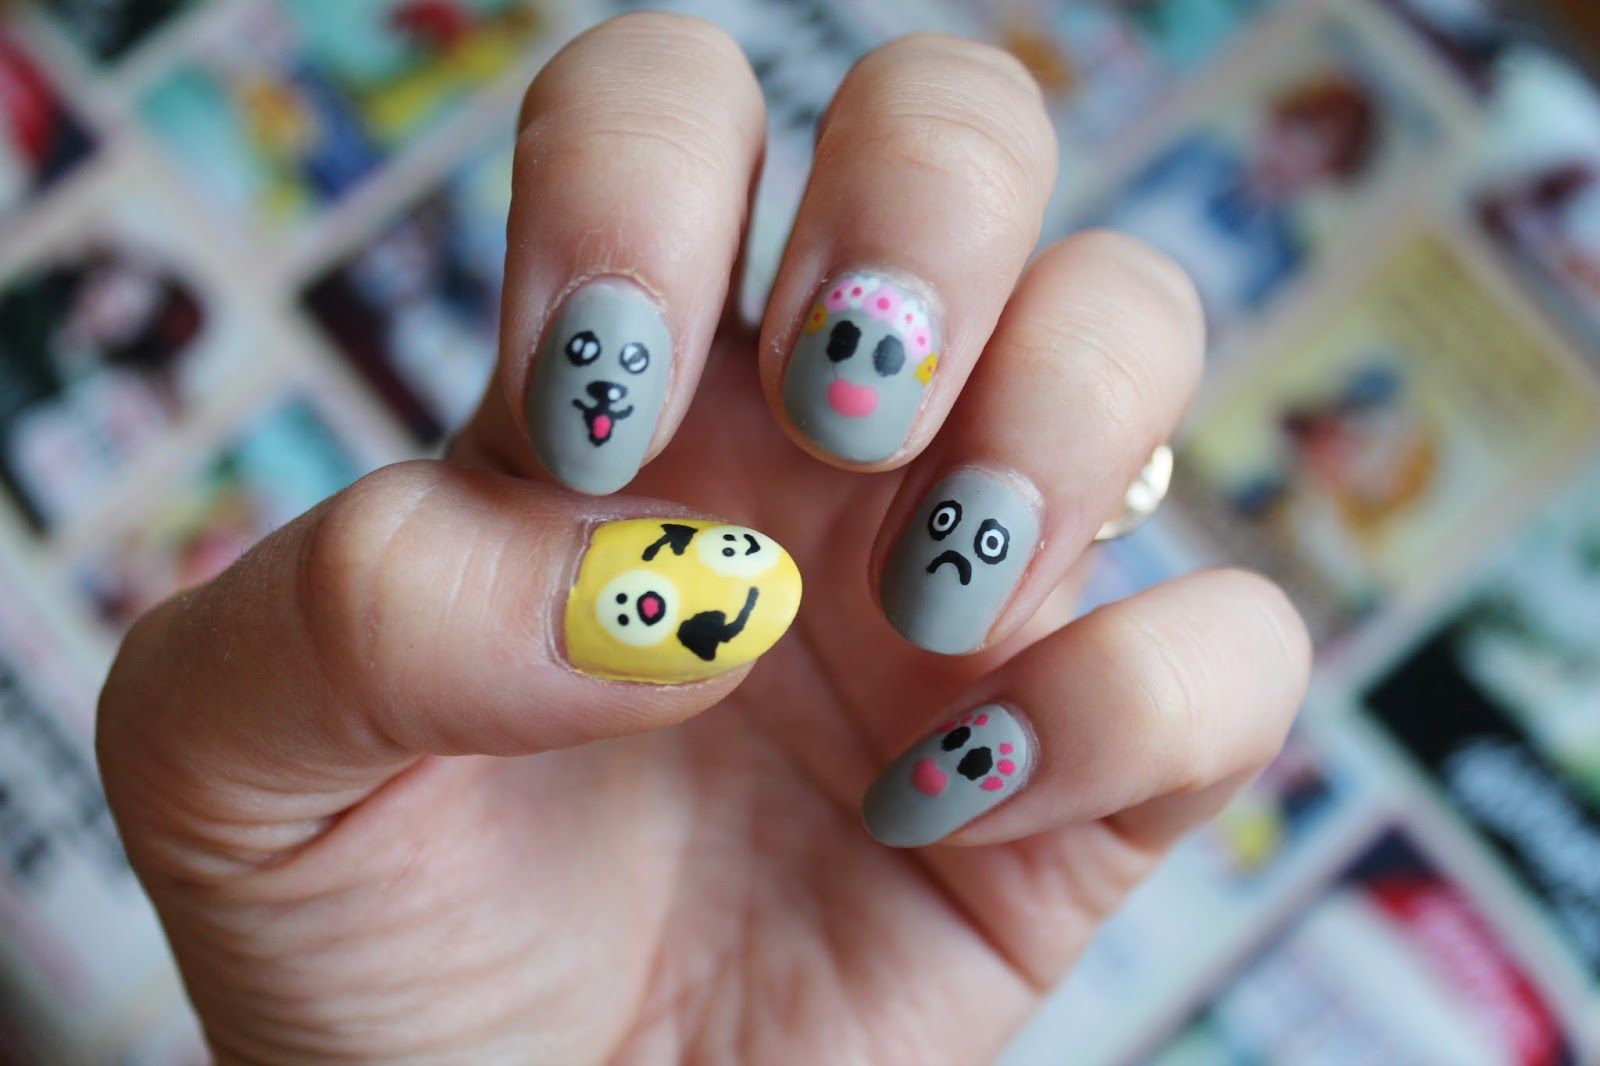 Snapchat Filter Nail Art - Jersey Girl, Texan Heart